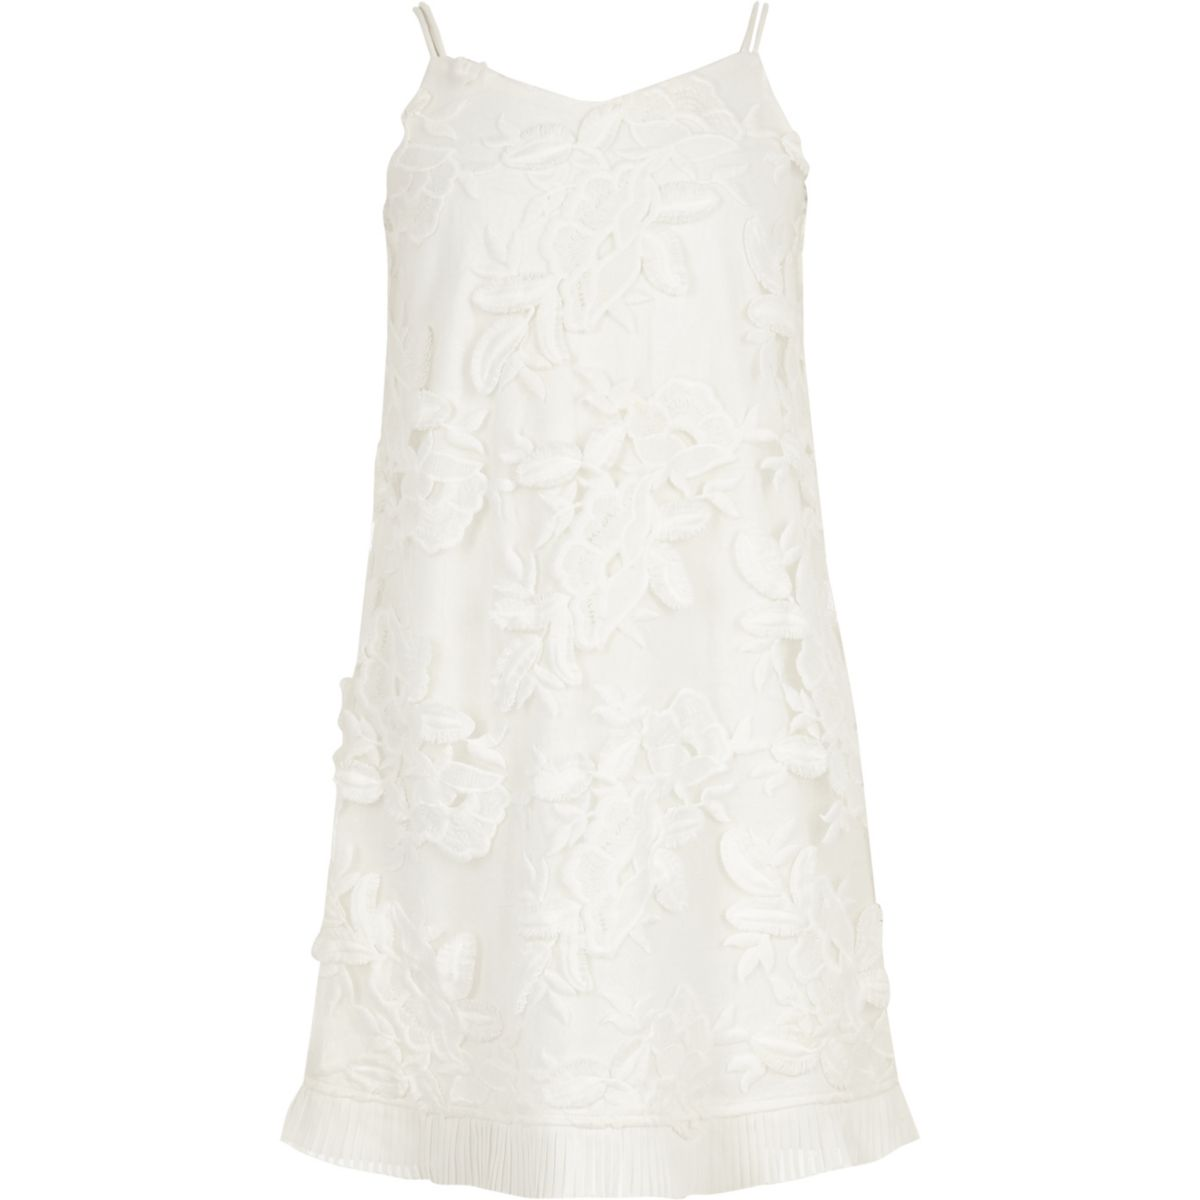 Girls white lace floral trapeze dress